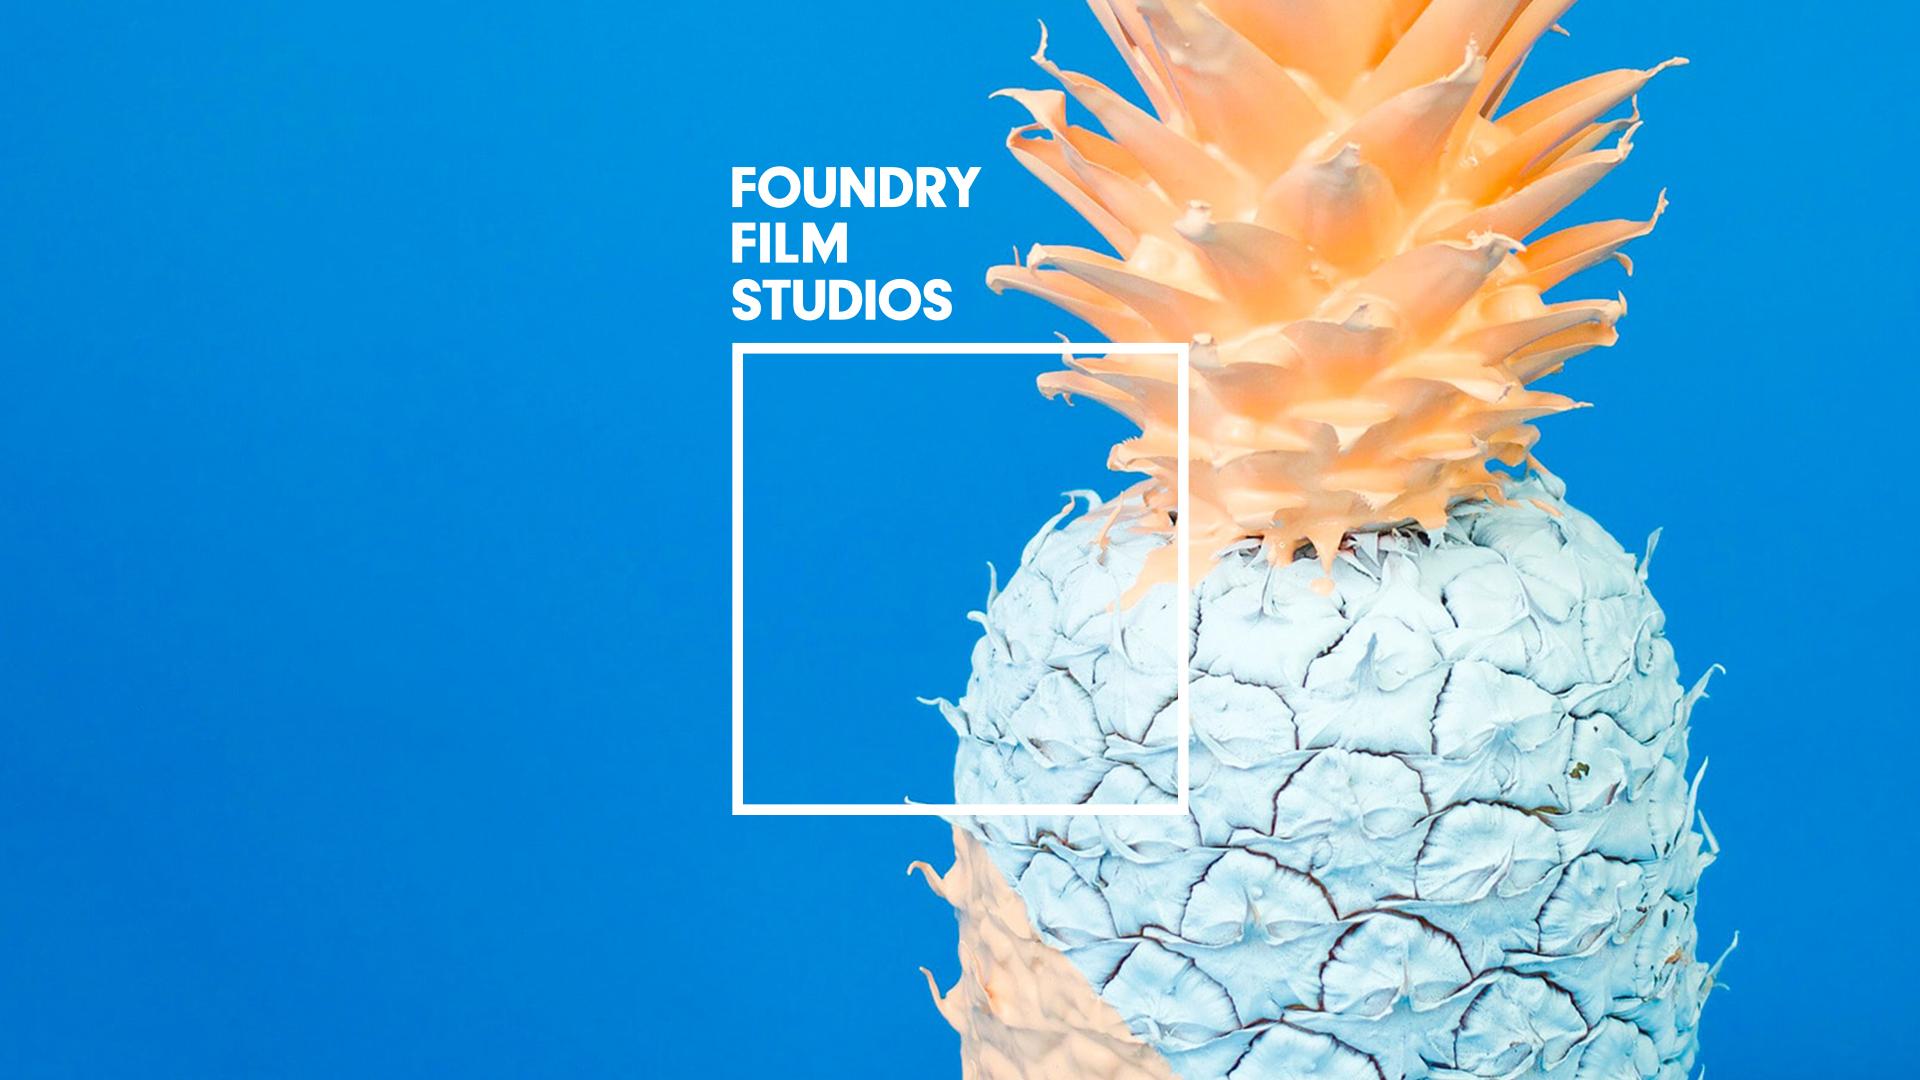 FoundryFilmStudios-WhiteLogoThumbs03